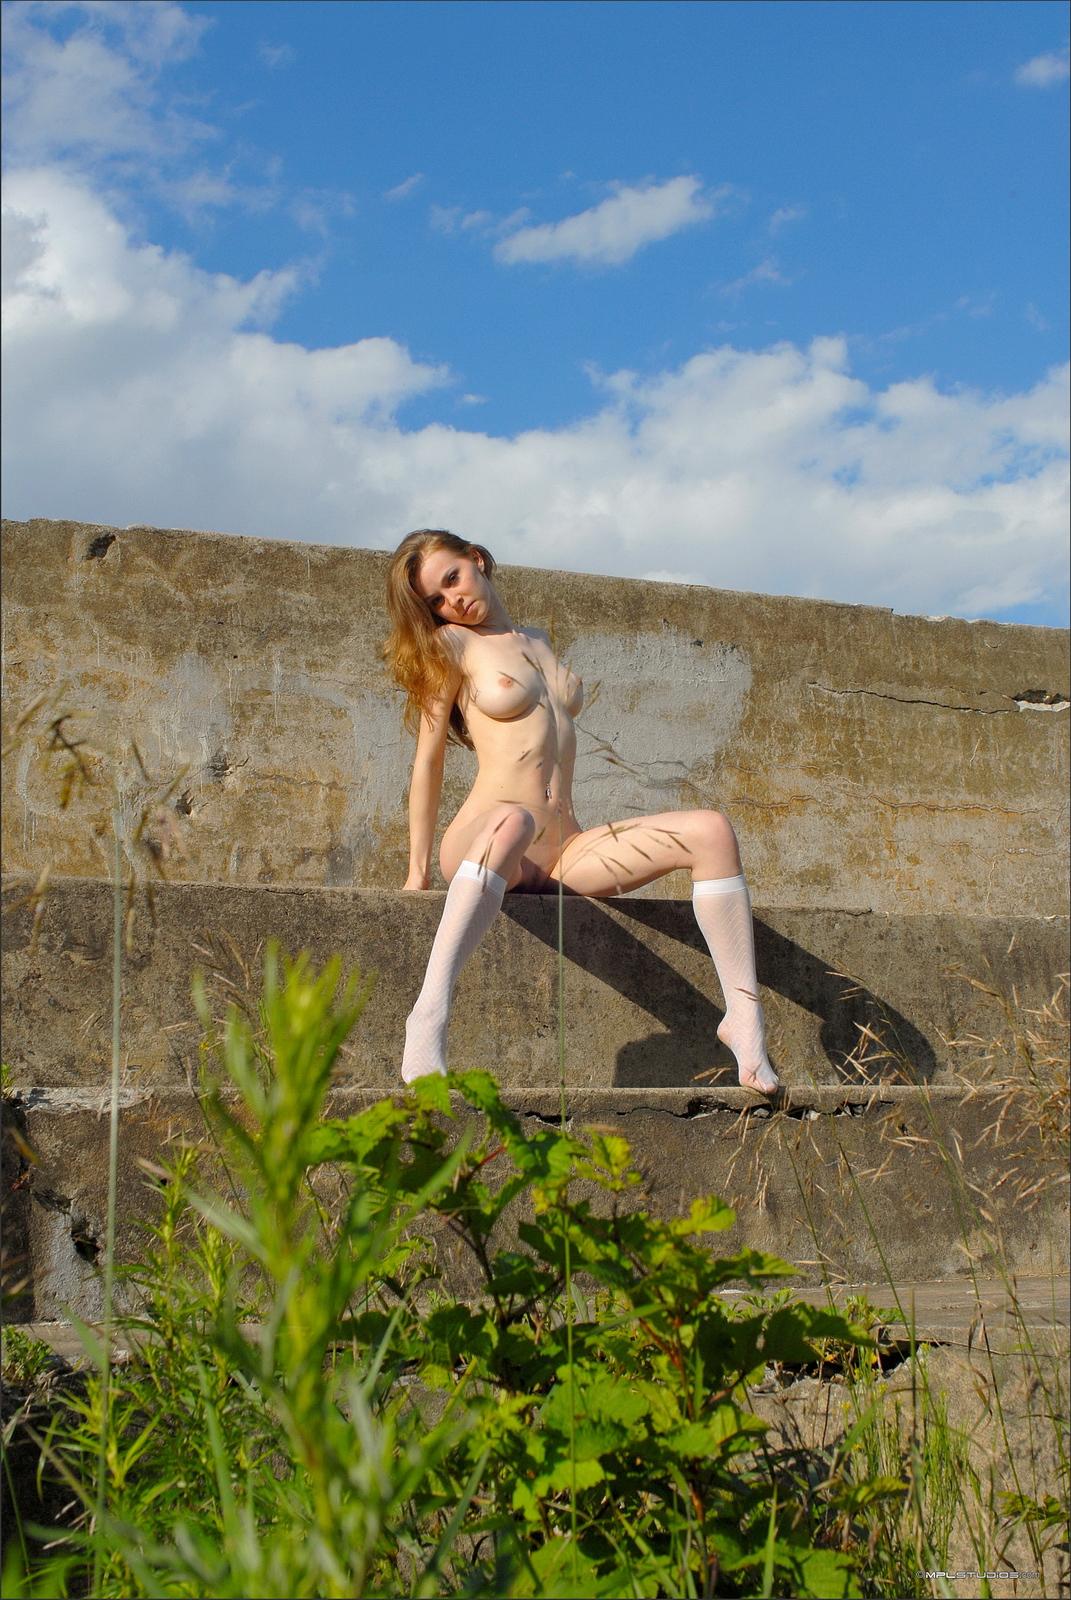 lidiya-concrete-wall-nude-slim-body-mplstudios-22